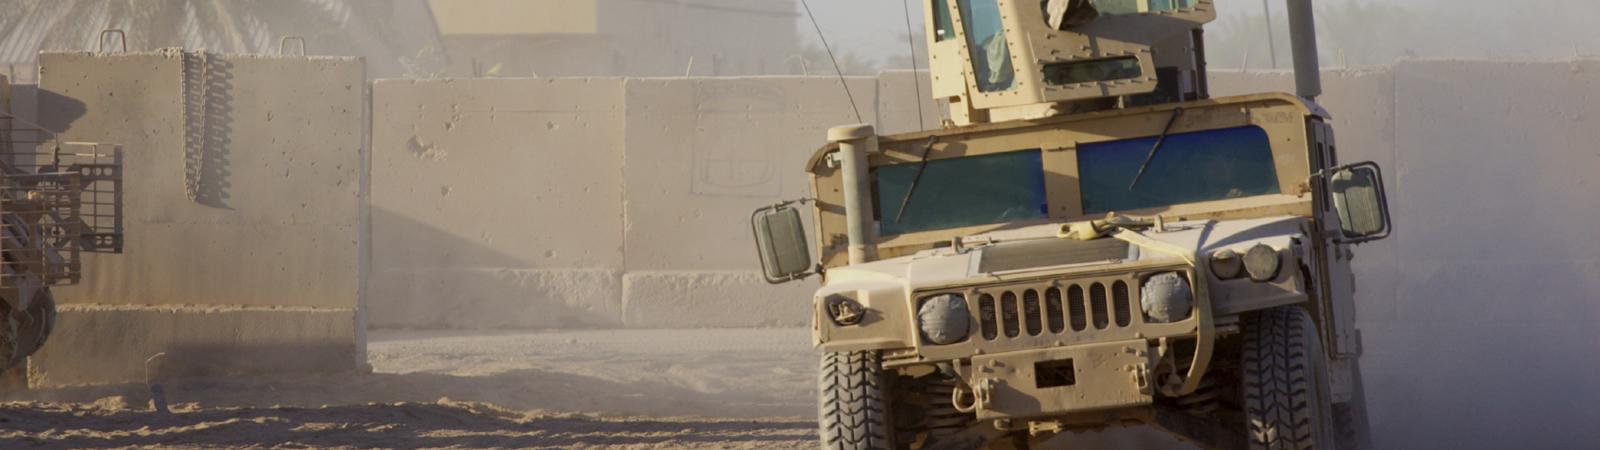 military-ammunition-banner-img